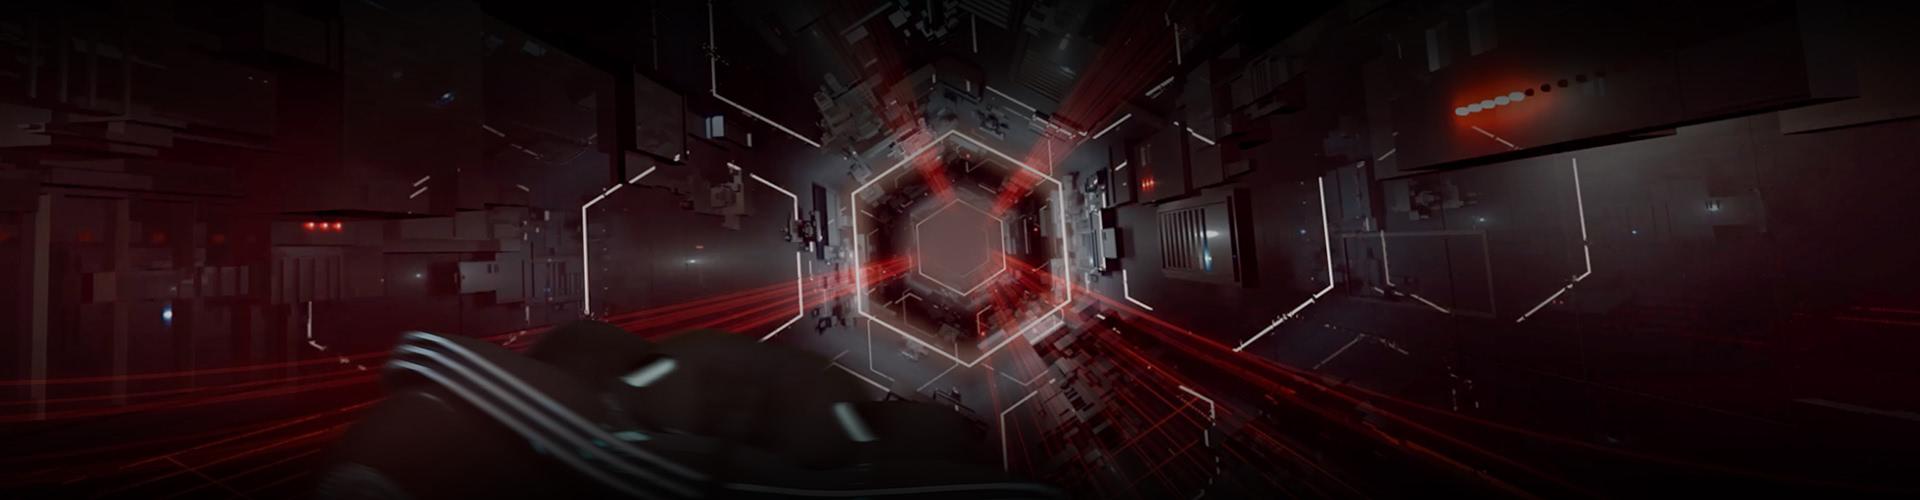 OnePlus 7 Pro Singapore